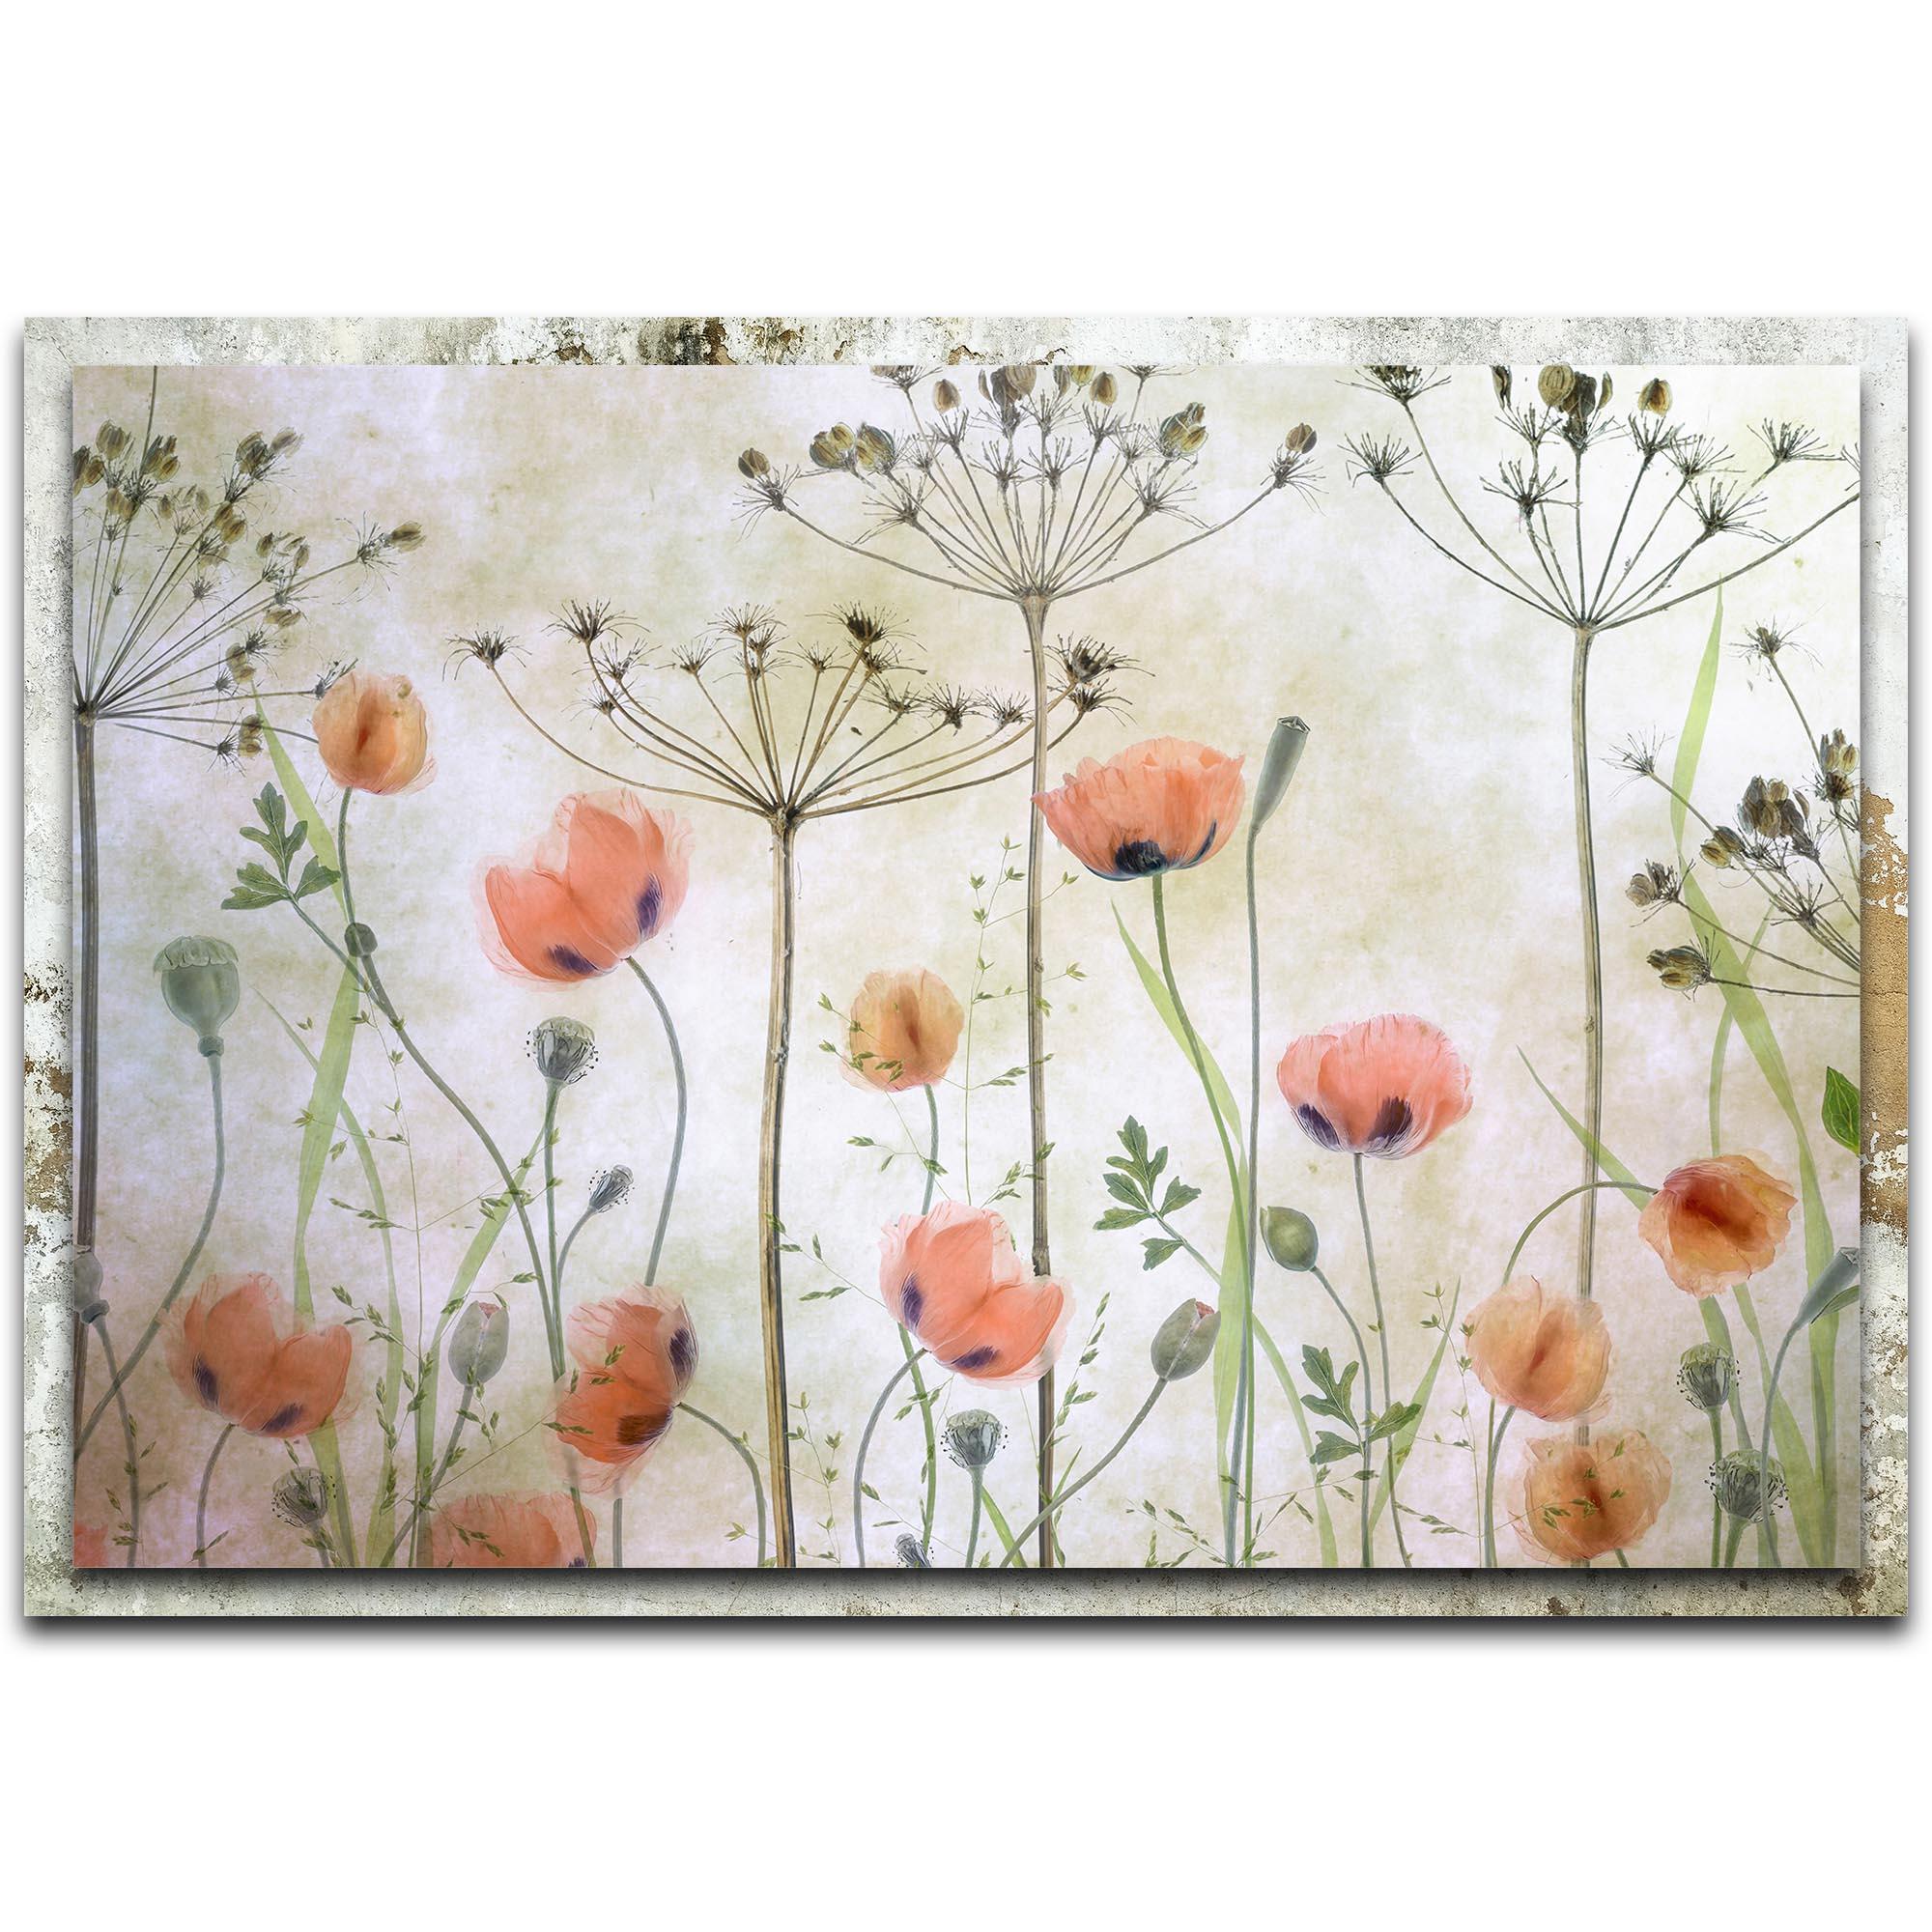 Mandy Disher 'Poppy Meadow' 32in x 22in Modern Farmhouse Floral on Metal